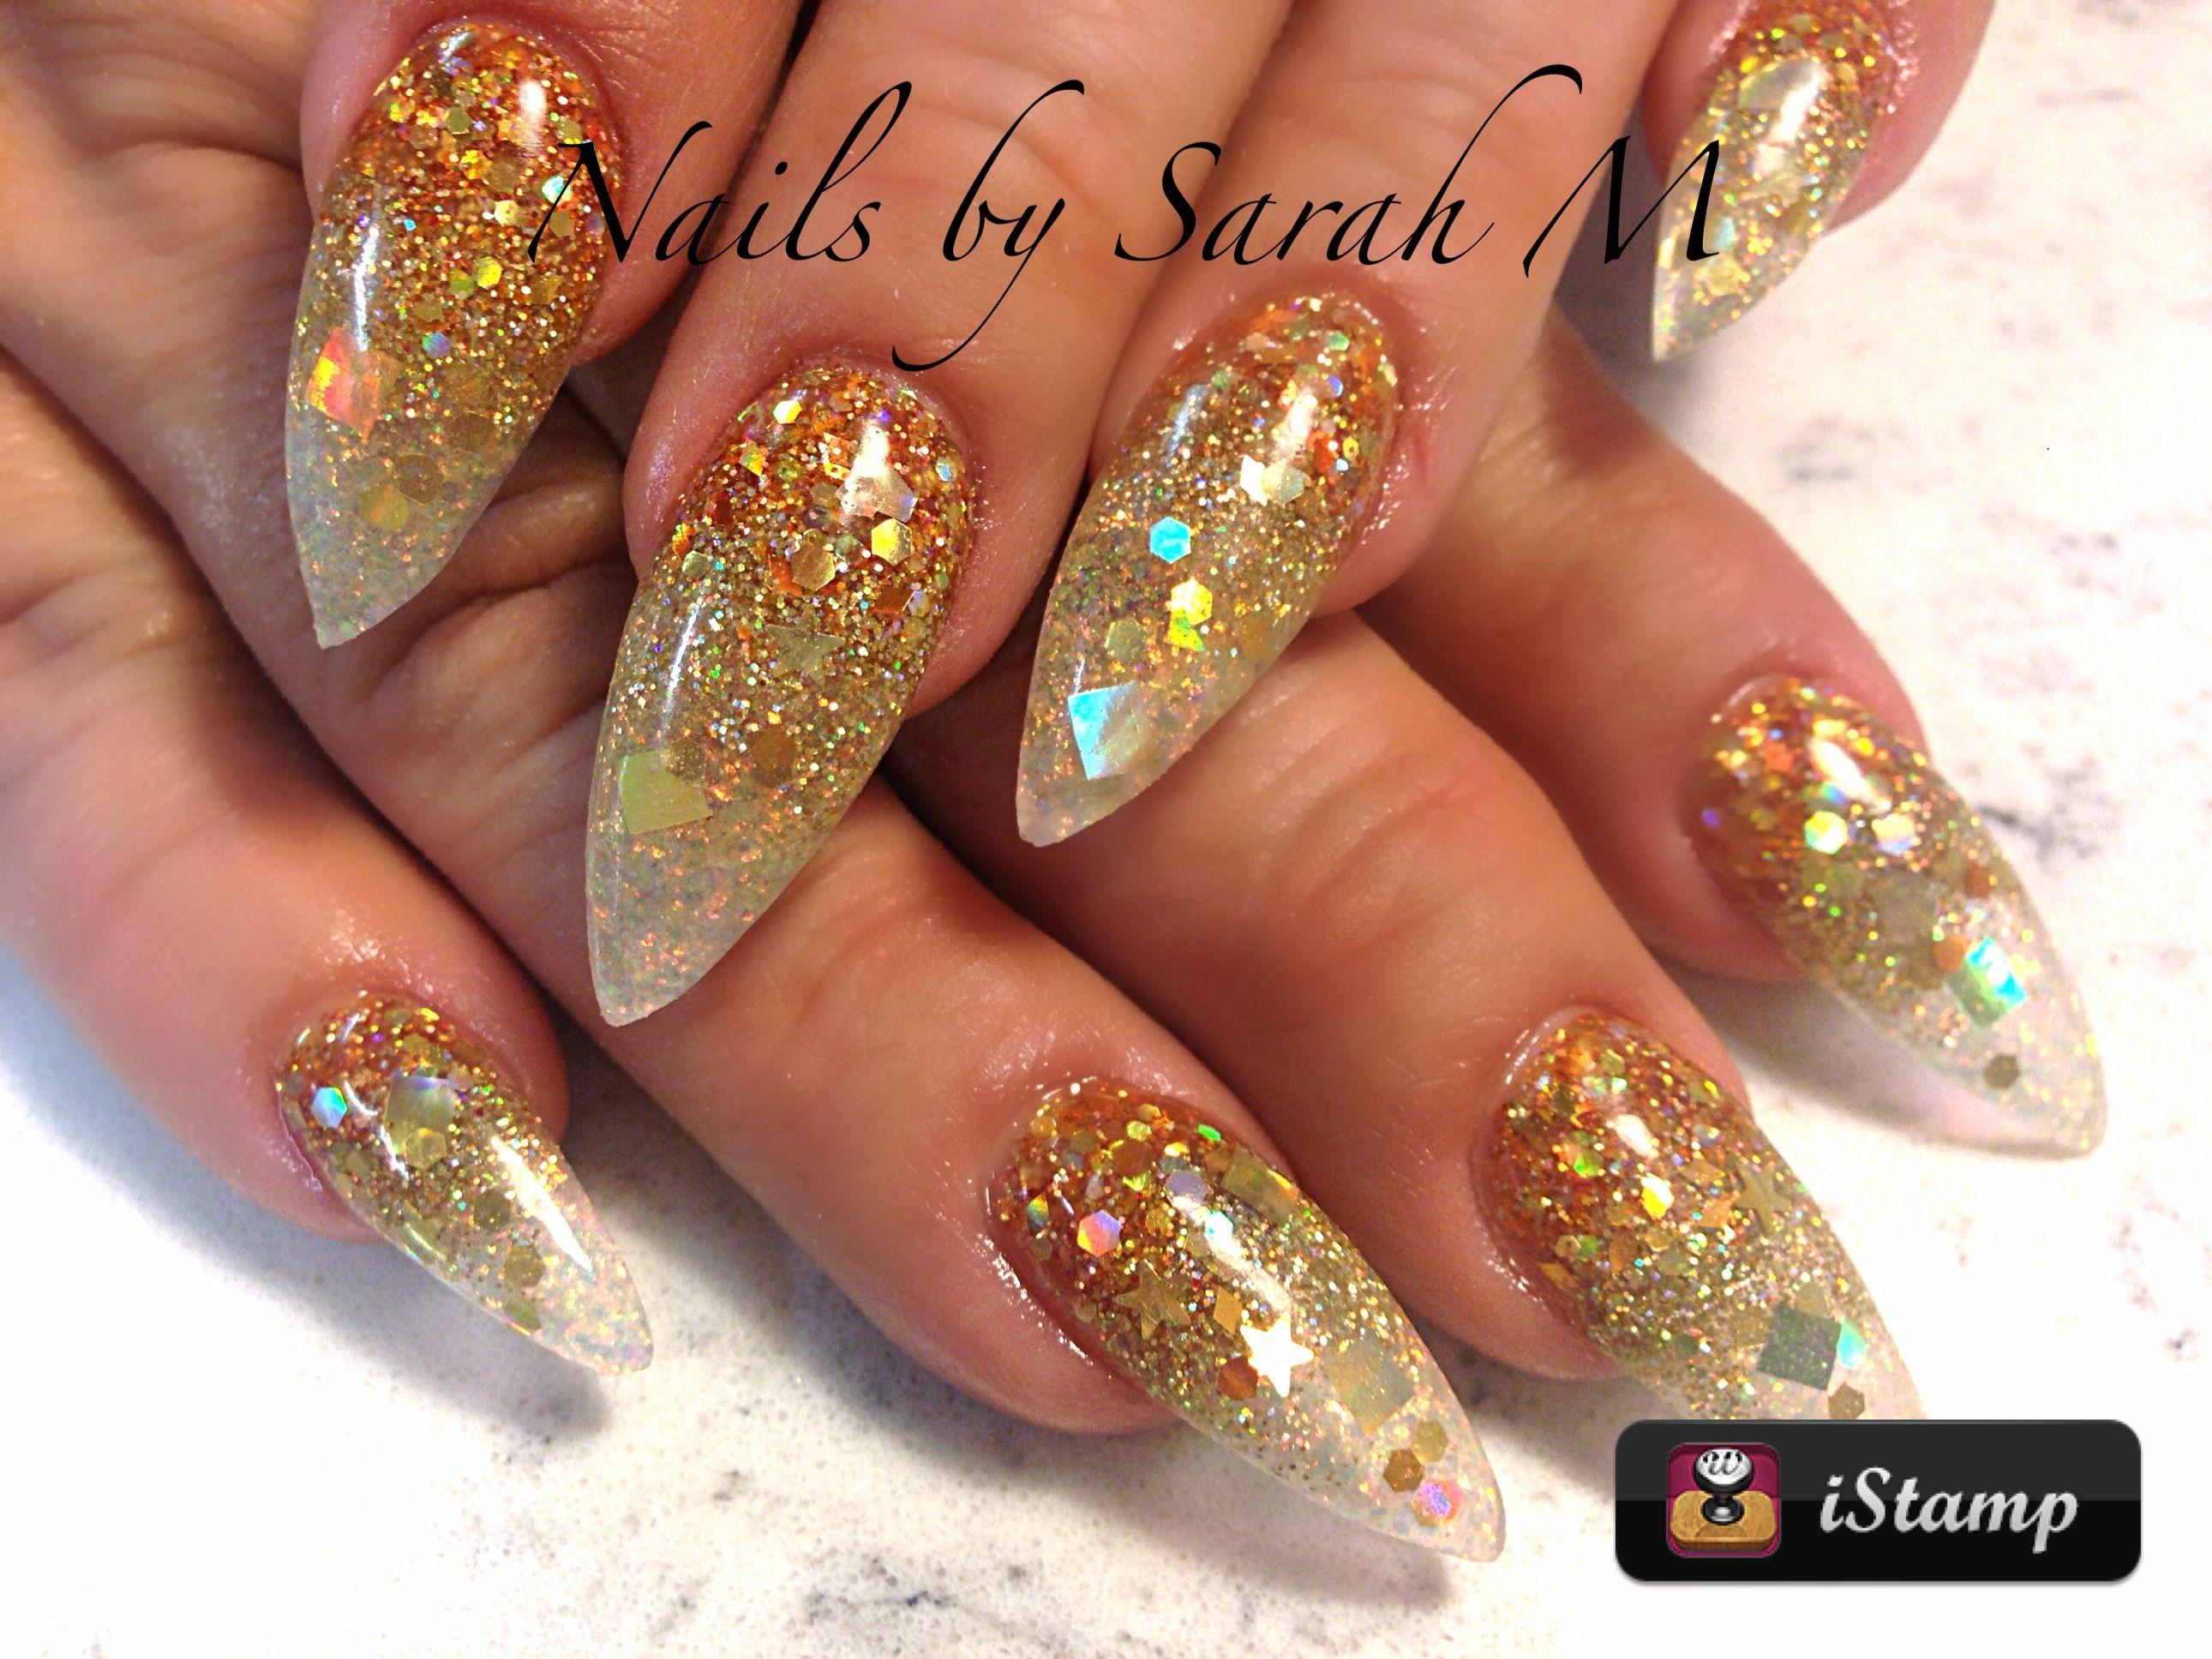 Acrylic fall stiletto nails | Nails By Sarah | Pinterest | Stilettos ...